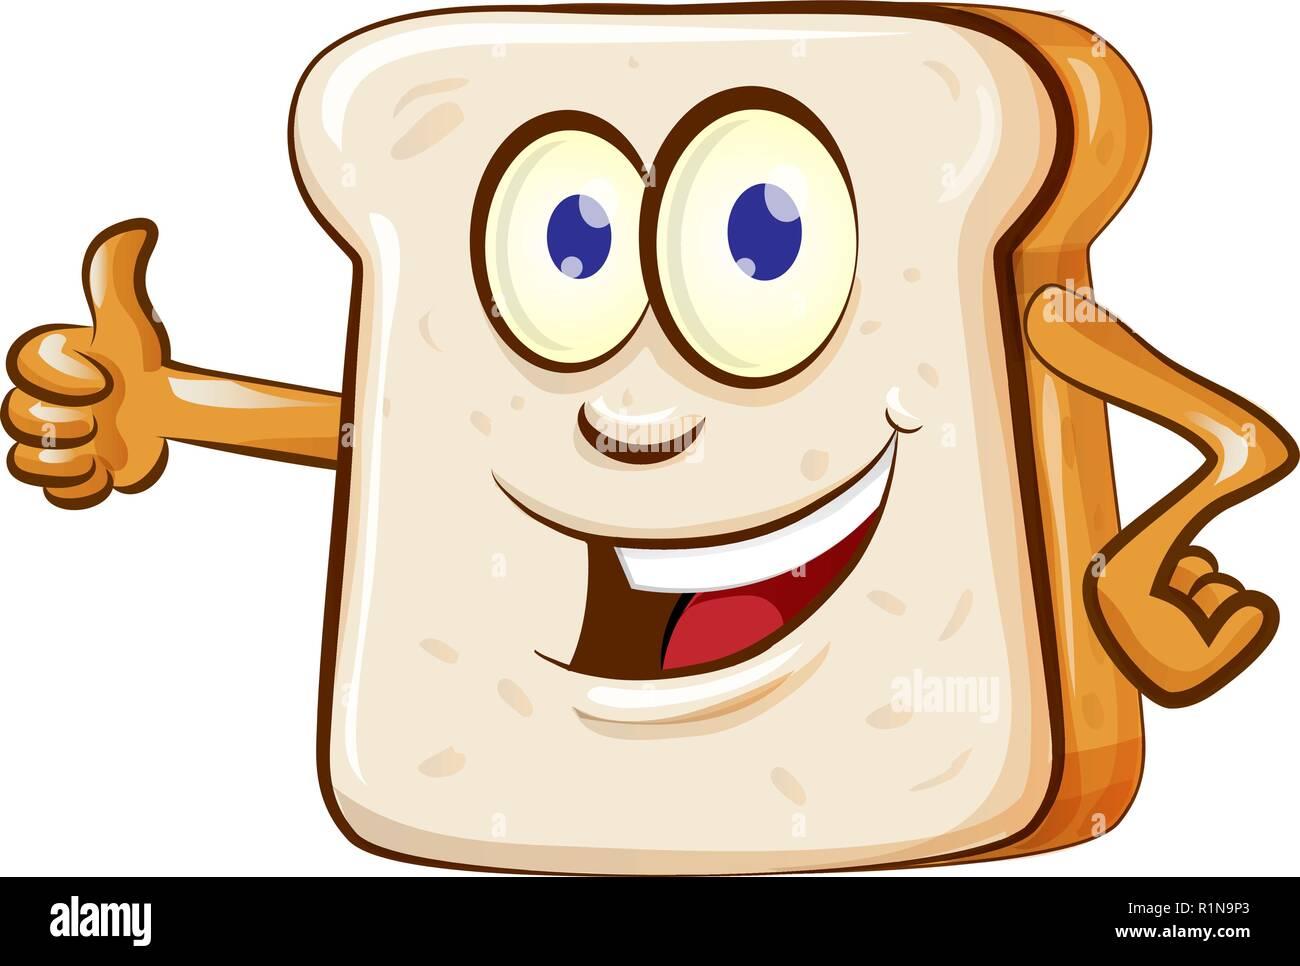 slice bread mascot cartoon isolated on white background - Stock Image